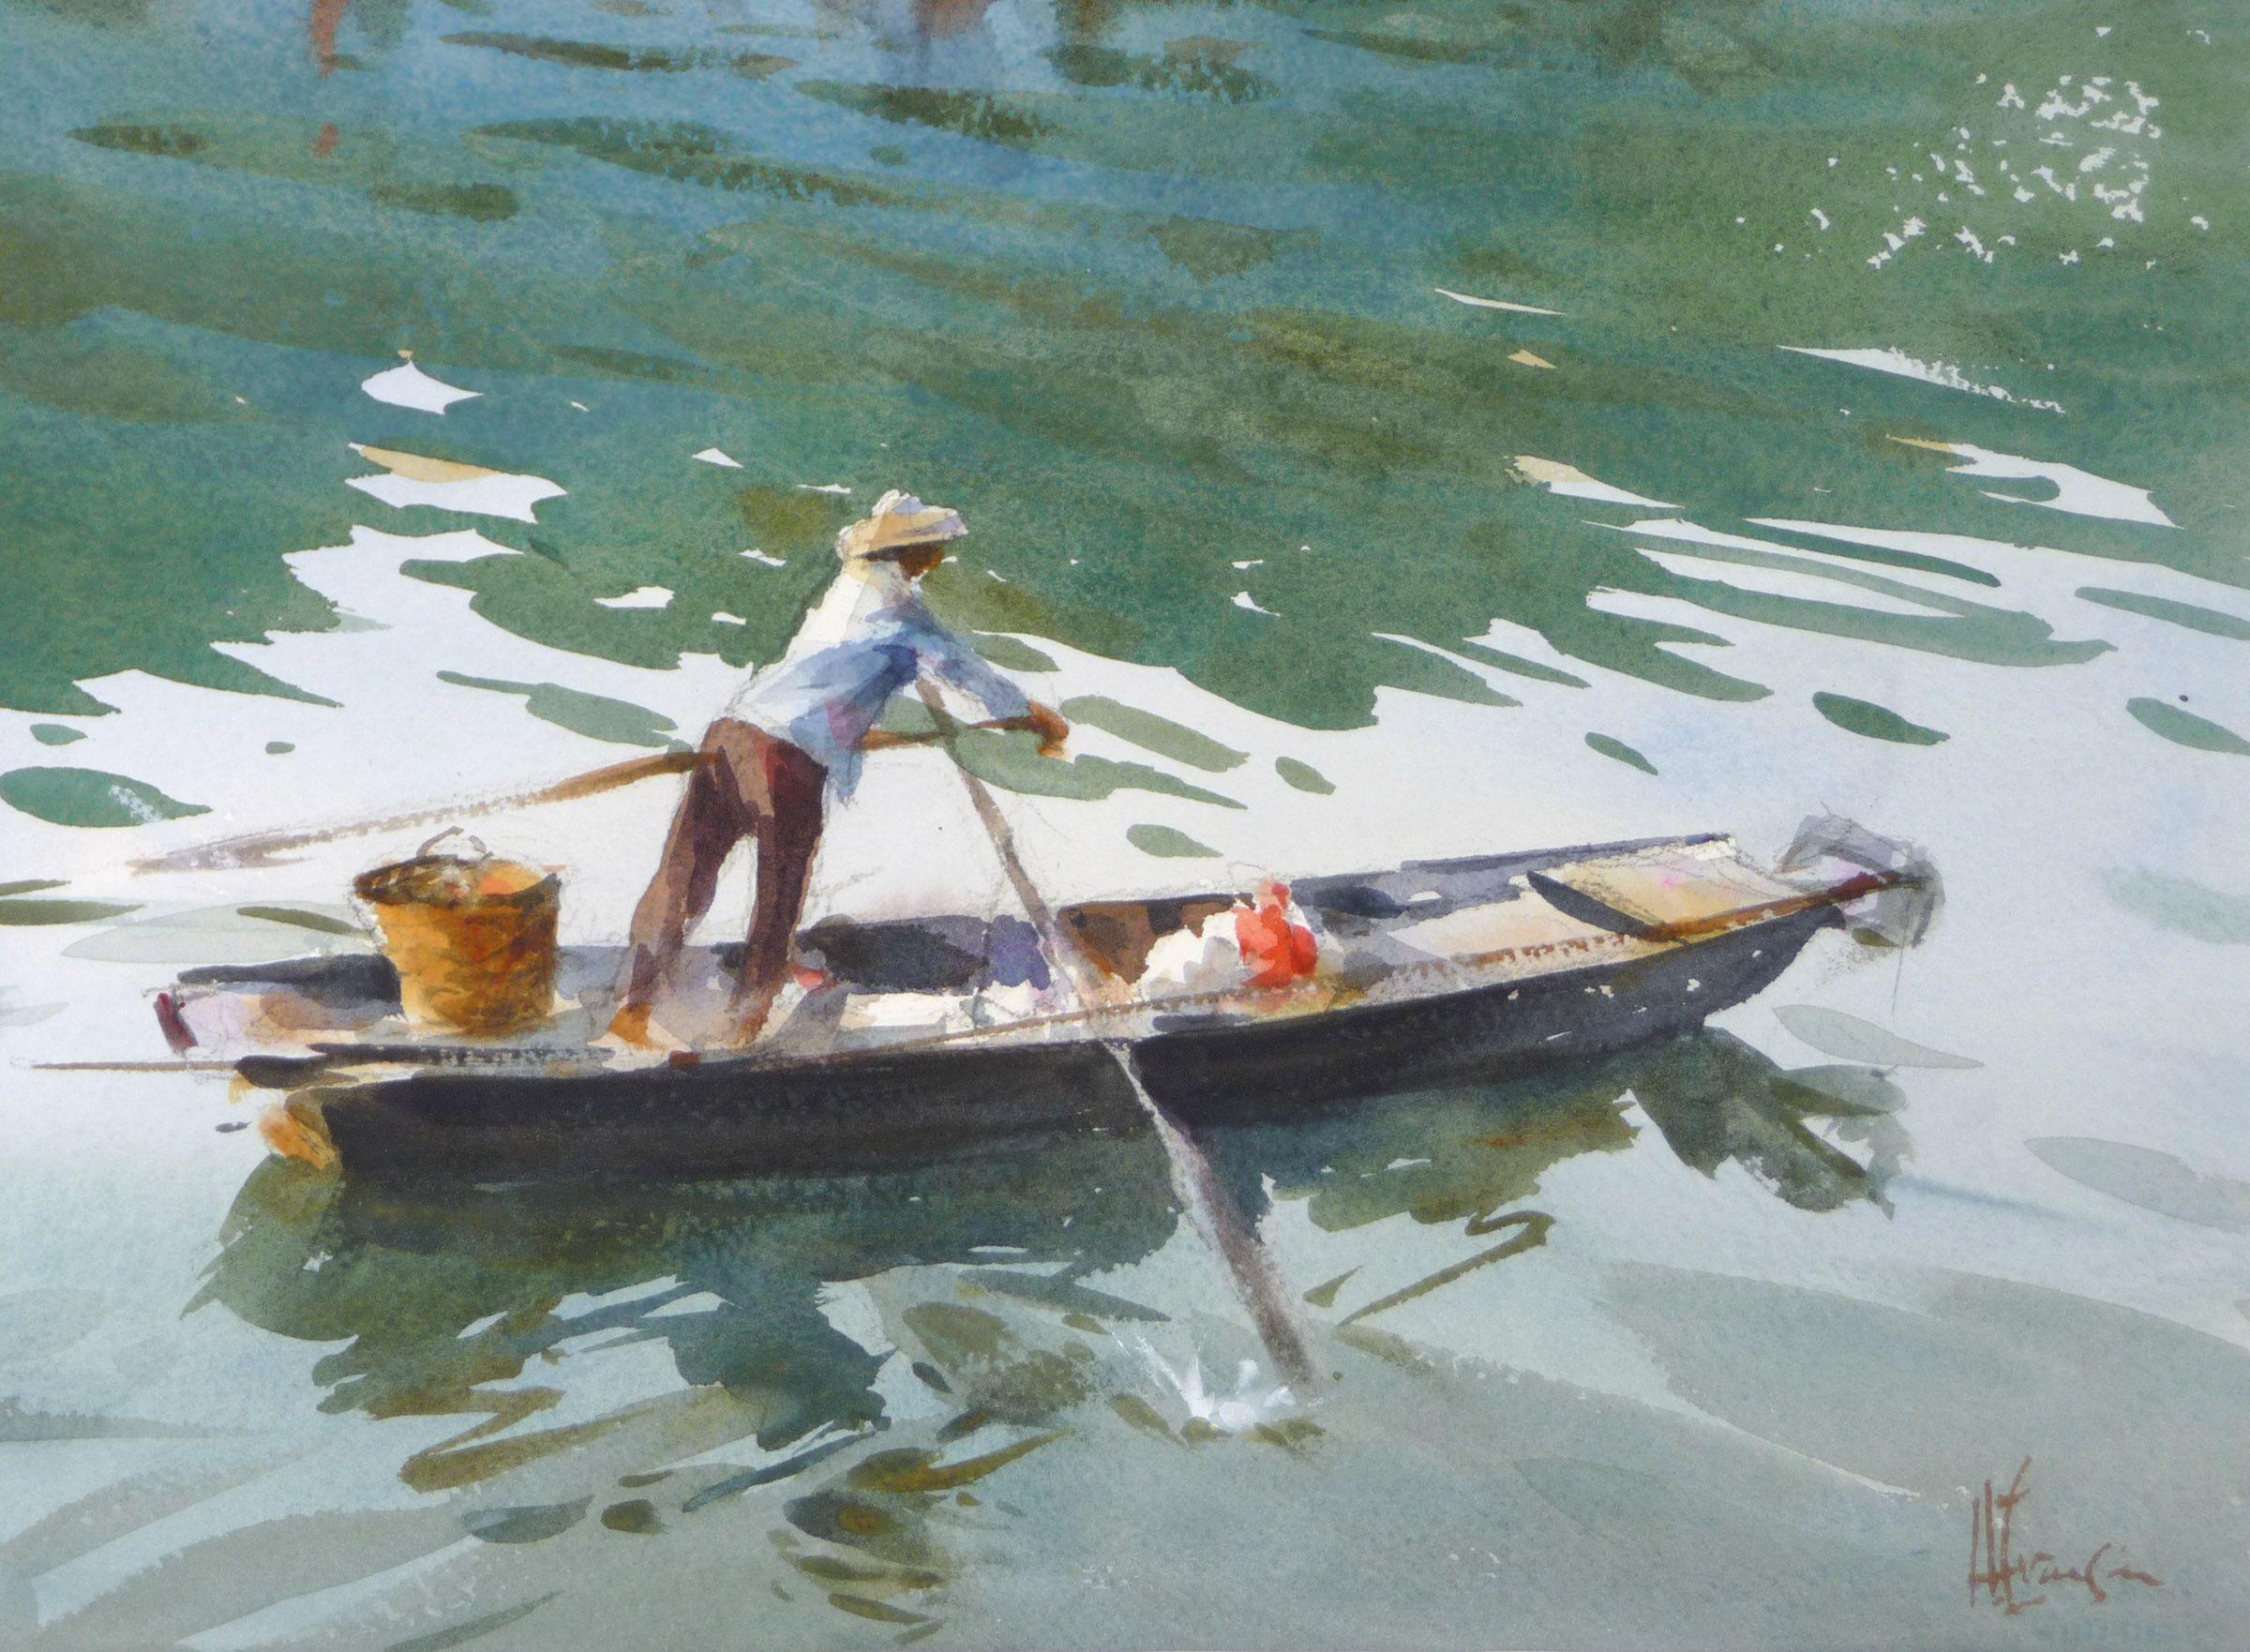 Watercolor artist magazine palm coast fl - Watercolor Artist Andy Evansen Navigating The Pearl